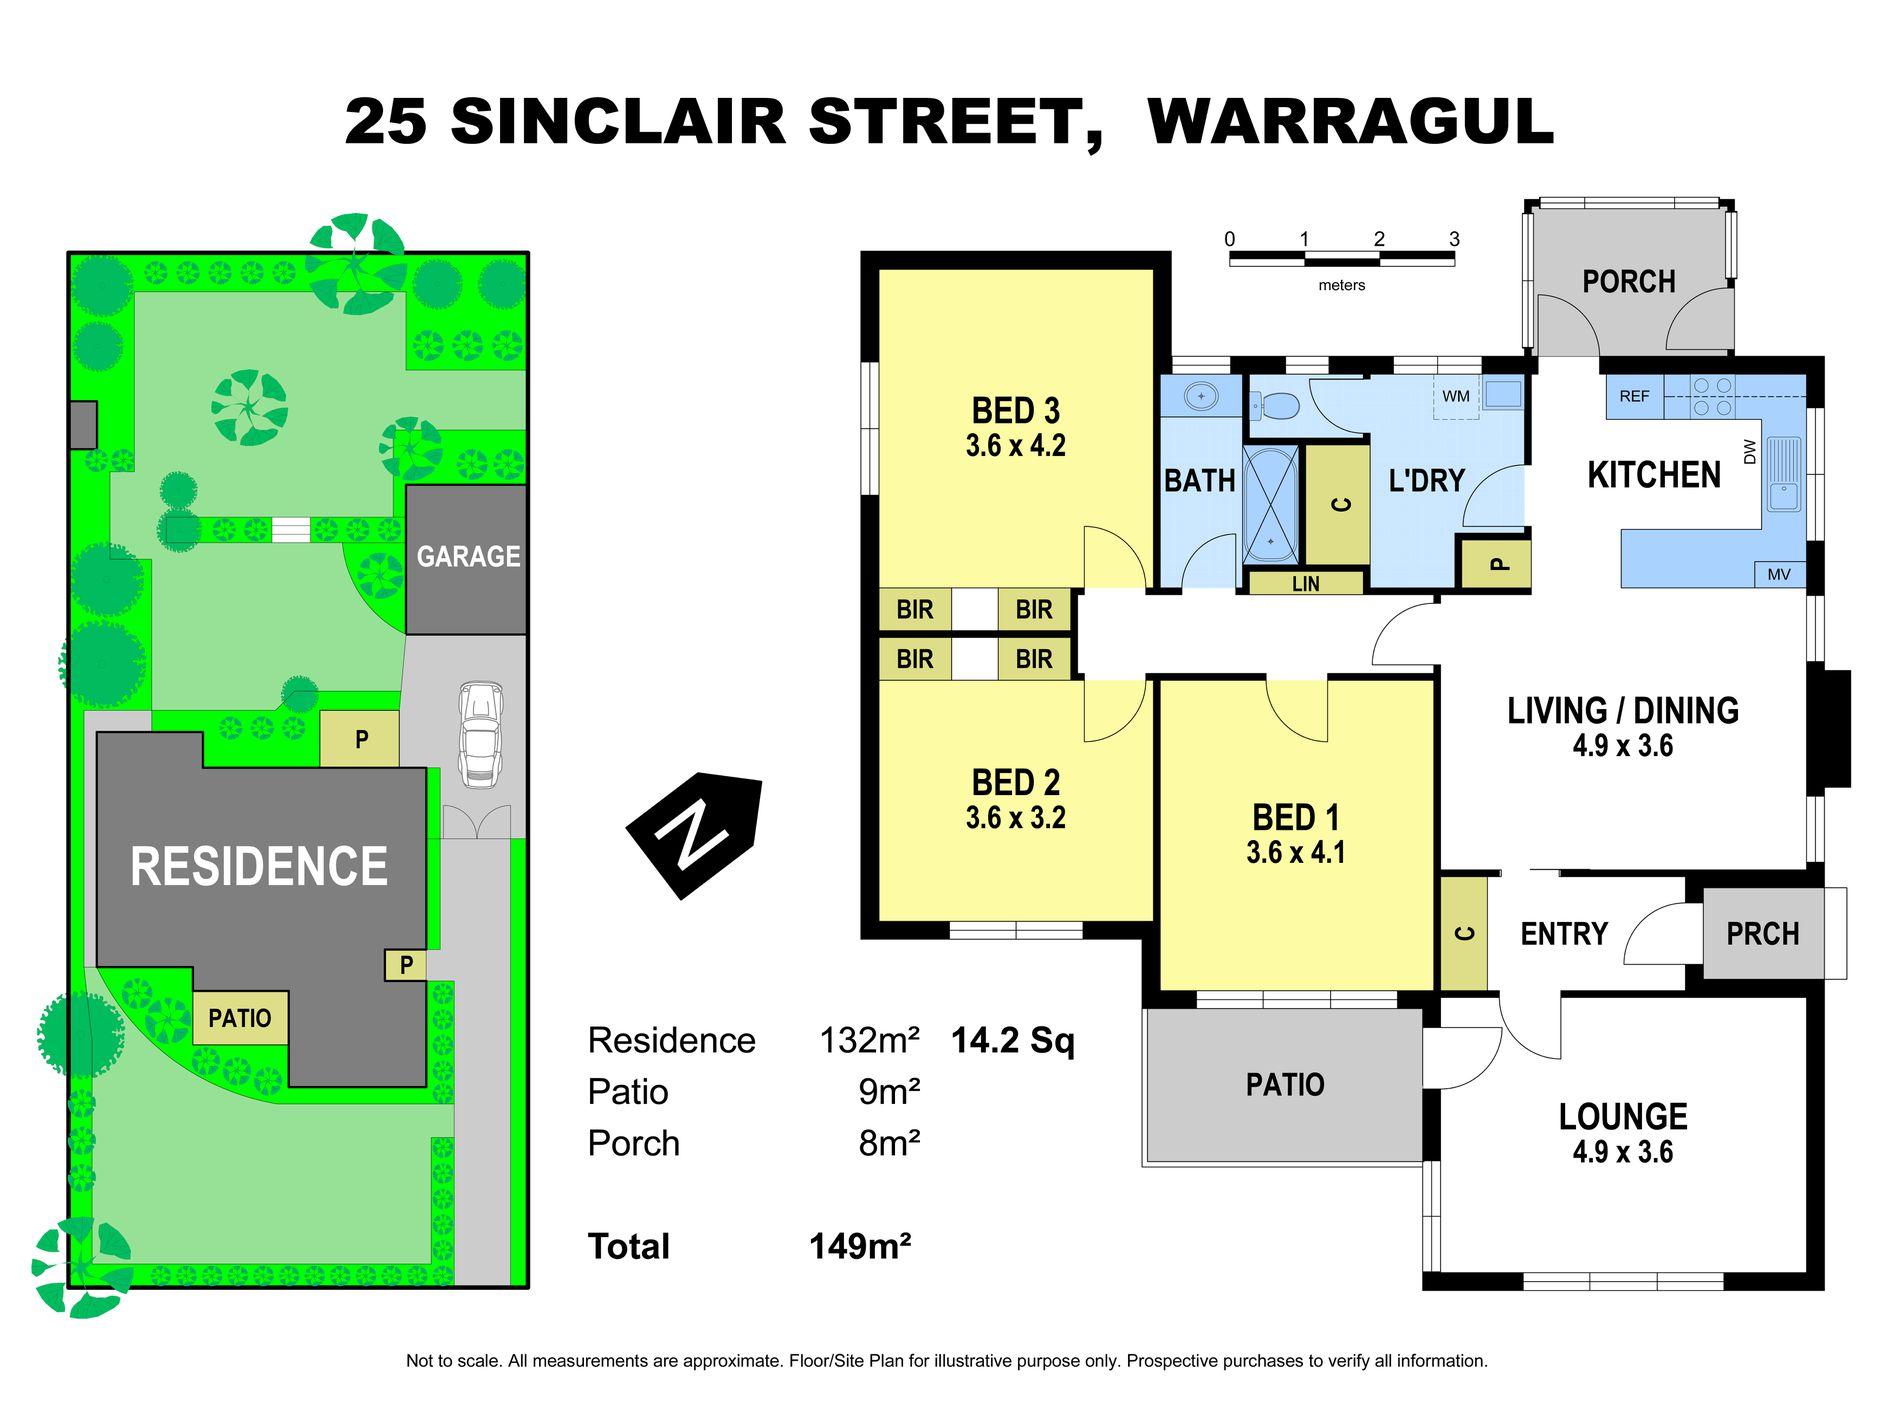 25 Sinclair Street, Warragul